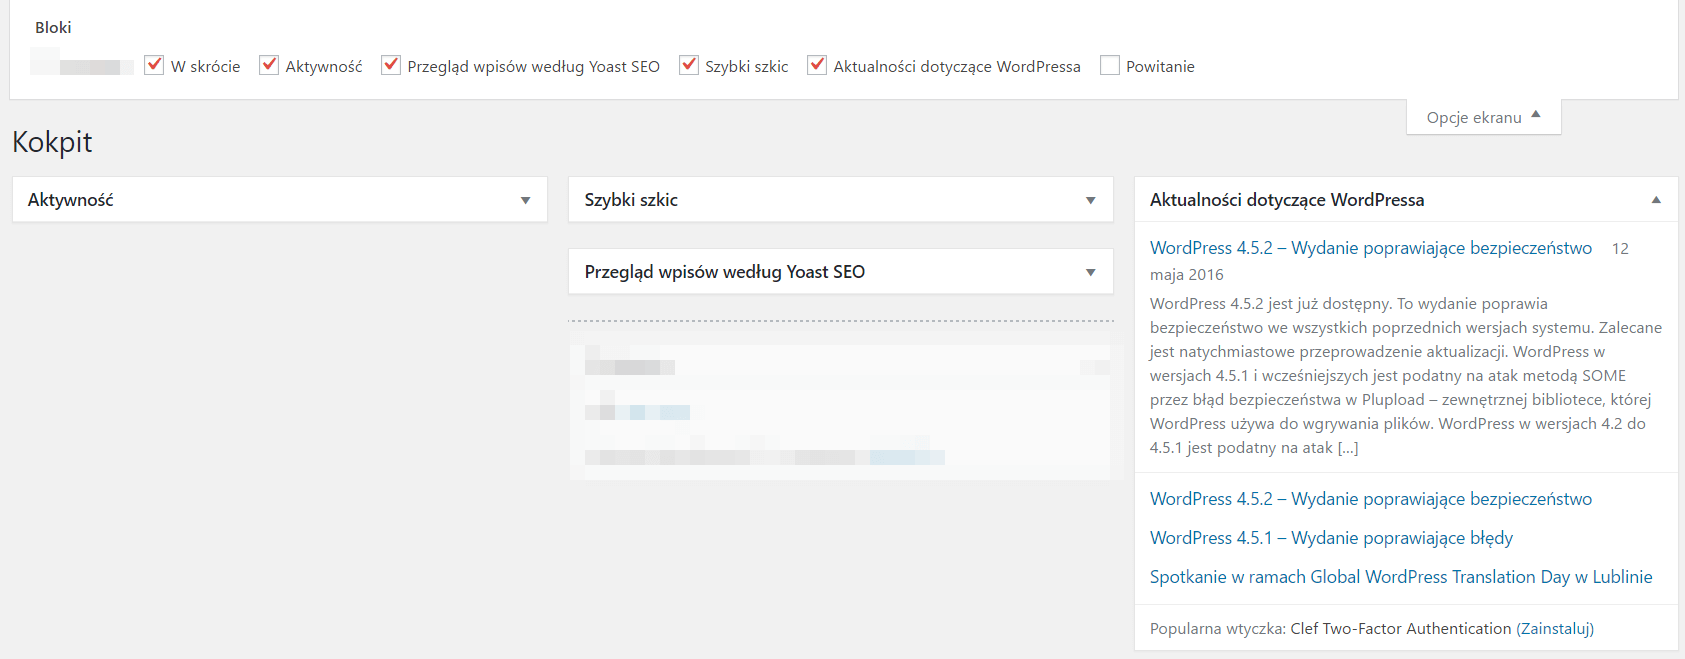 Ukryte funkcje WordPress kokpit